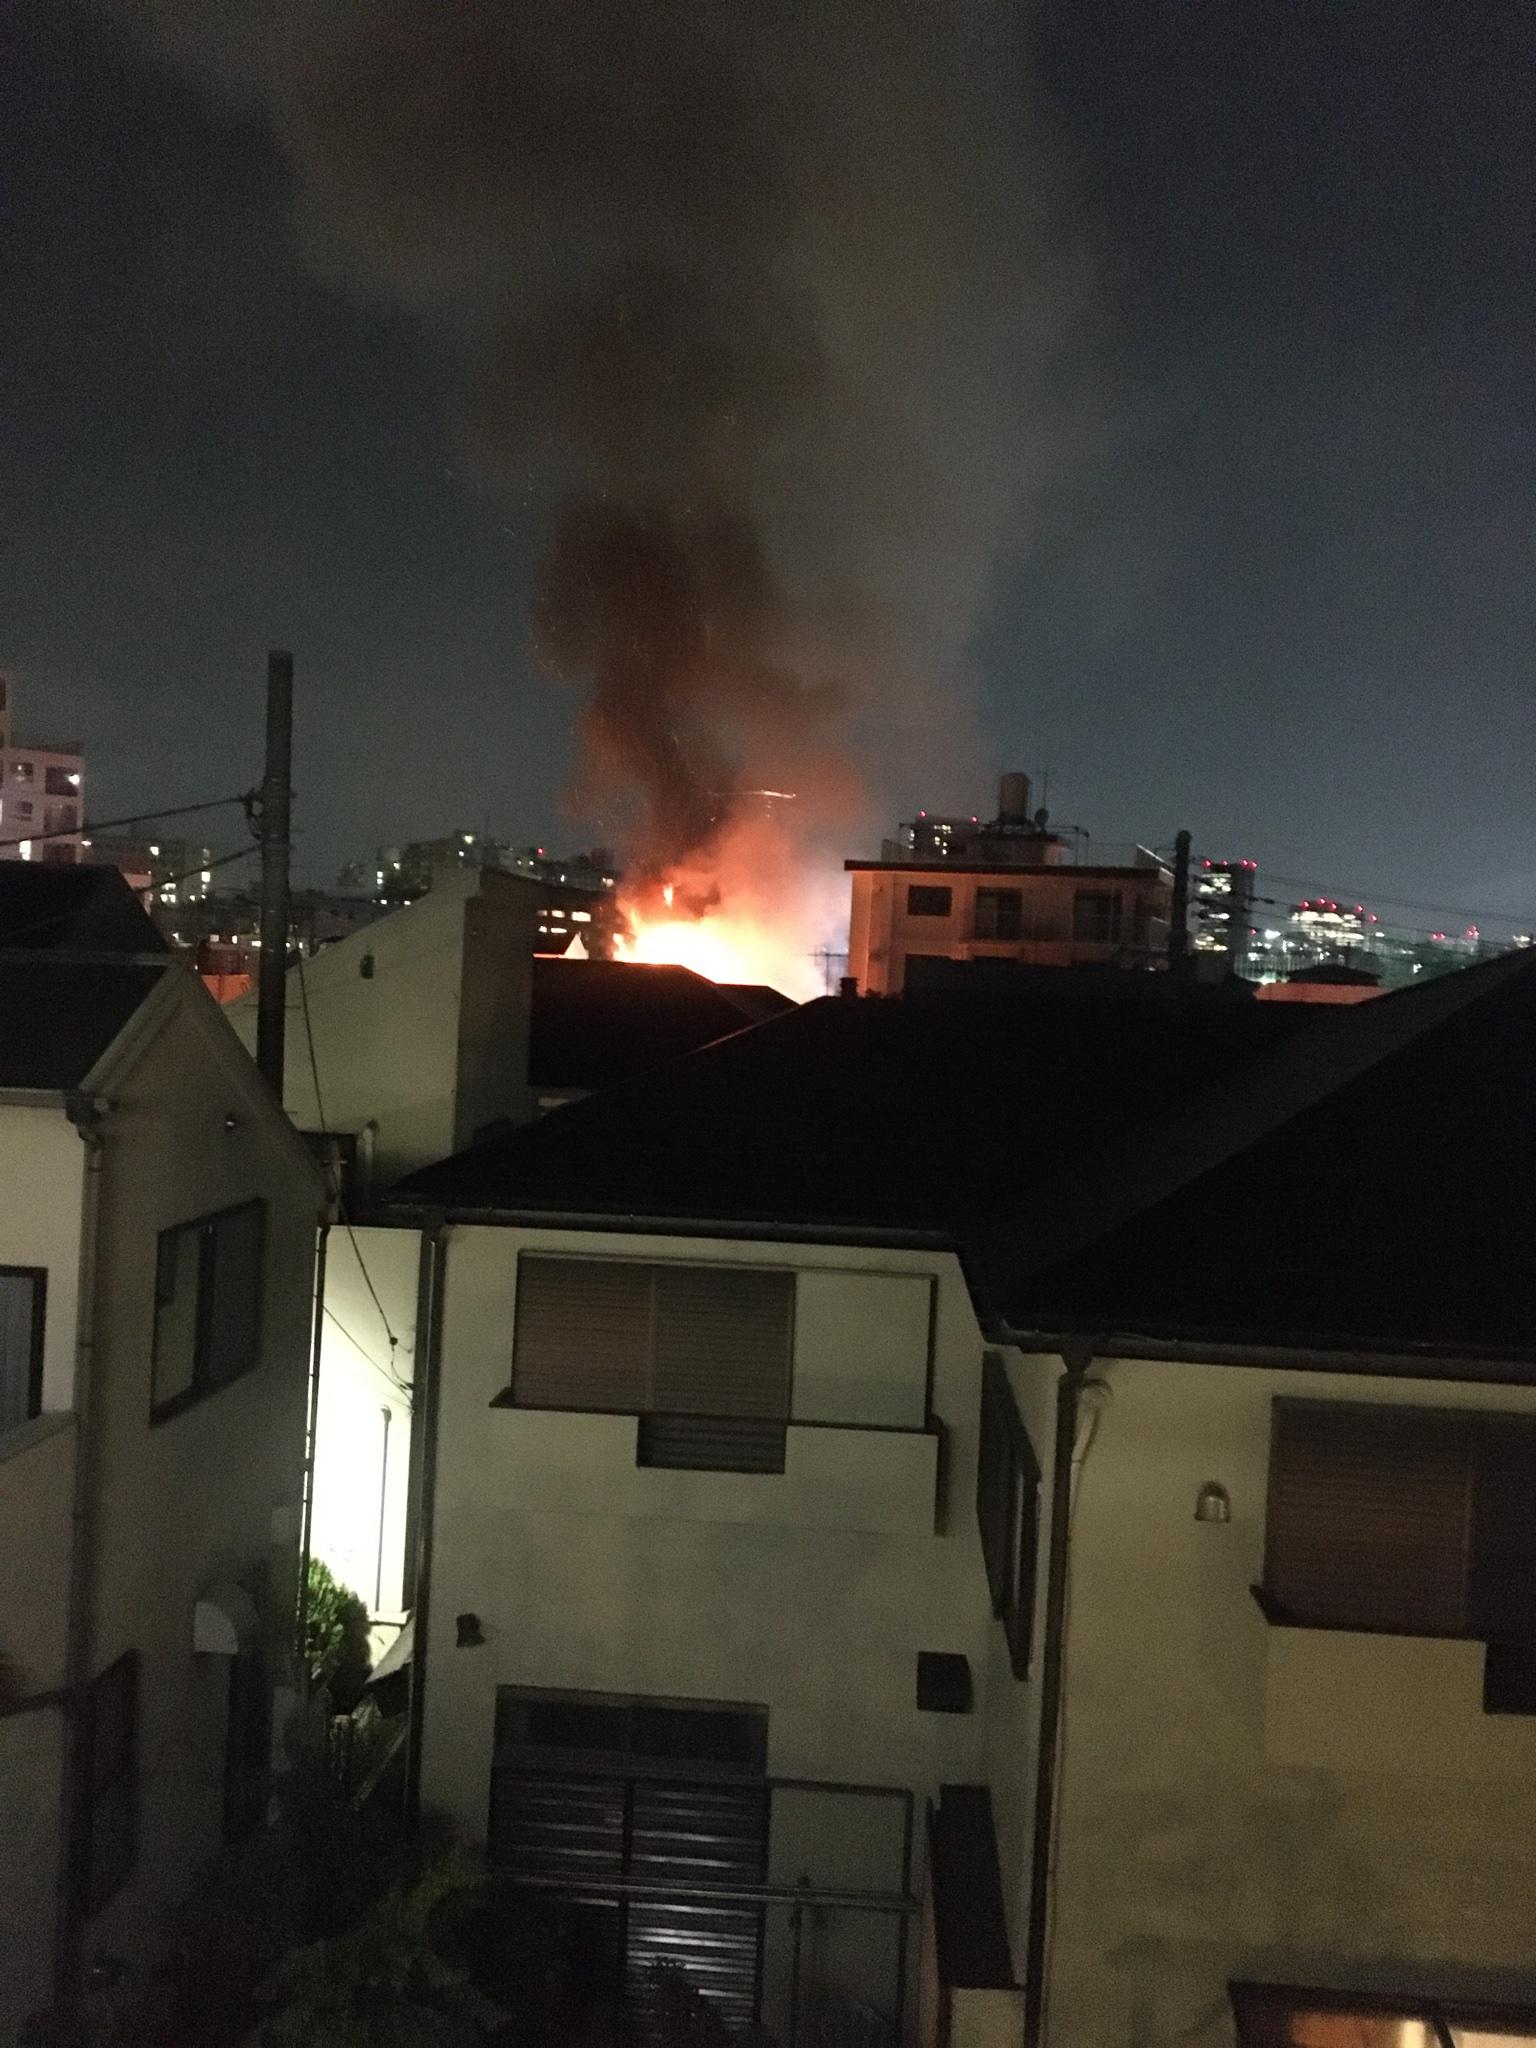 画像,火事近い https://t.co/XxeCiaTBnP。